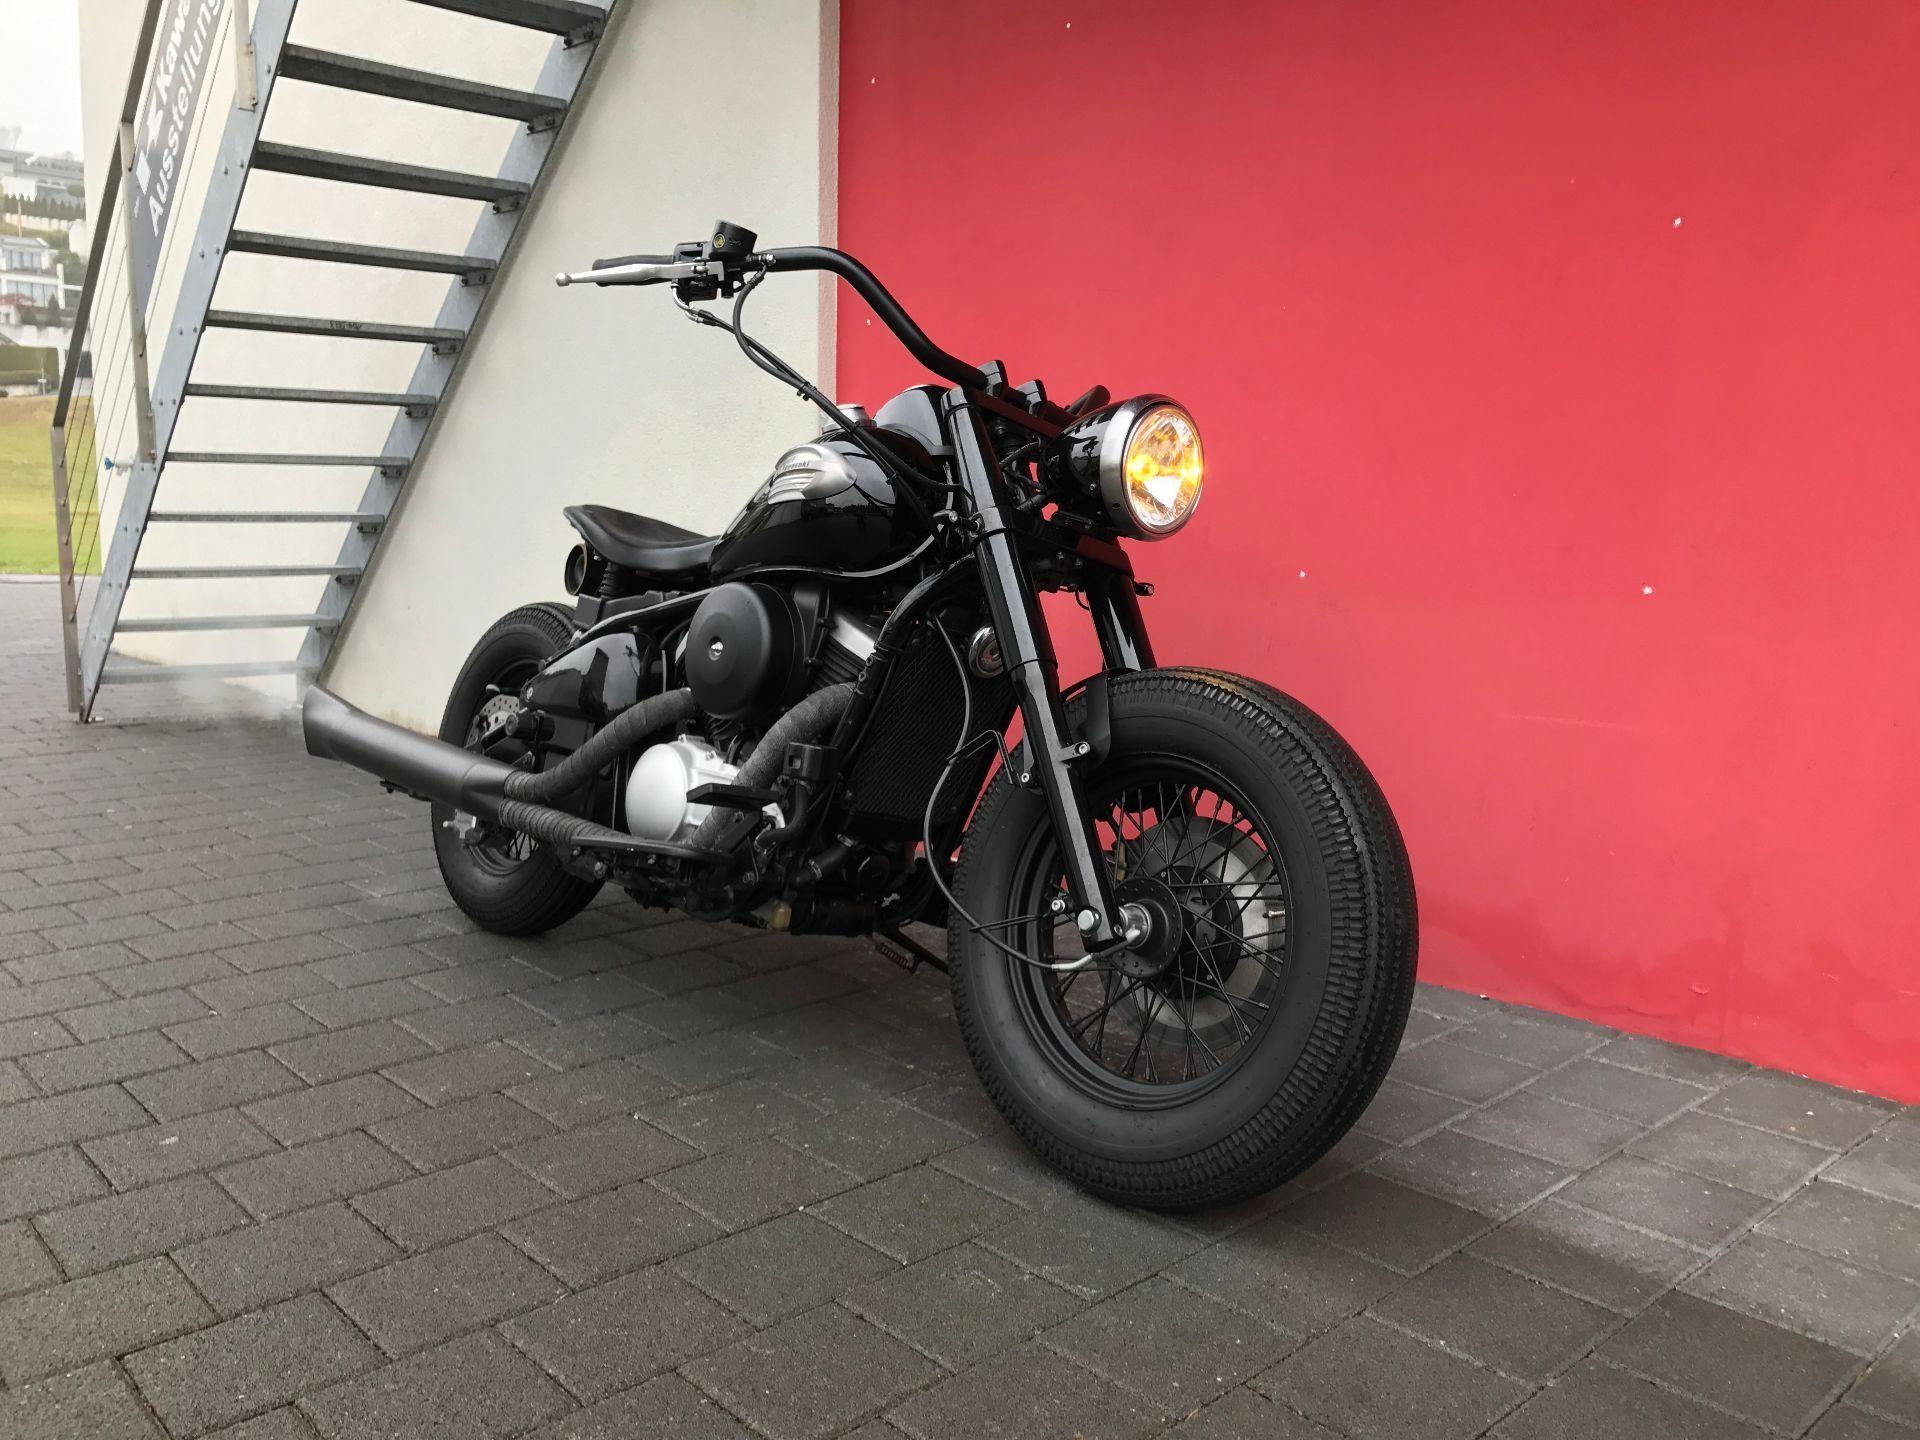 moto occasions acheter kawasaki vn 800 drifter bobber hans leupi gmbh meggen. Black Bedroom Furniture Sets. Home Design Ideas